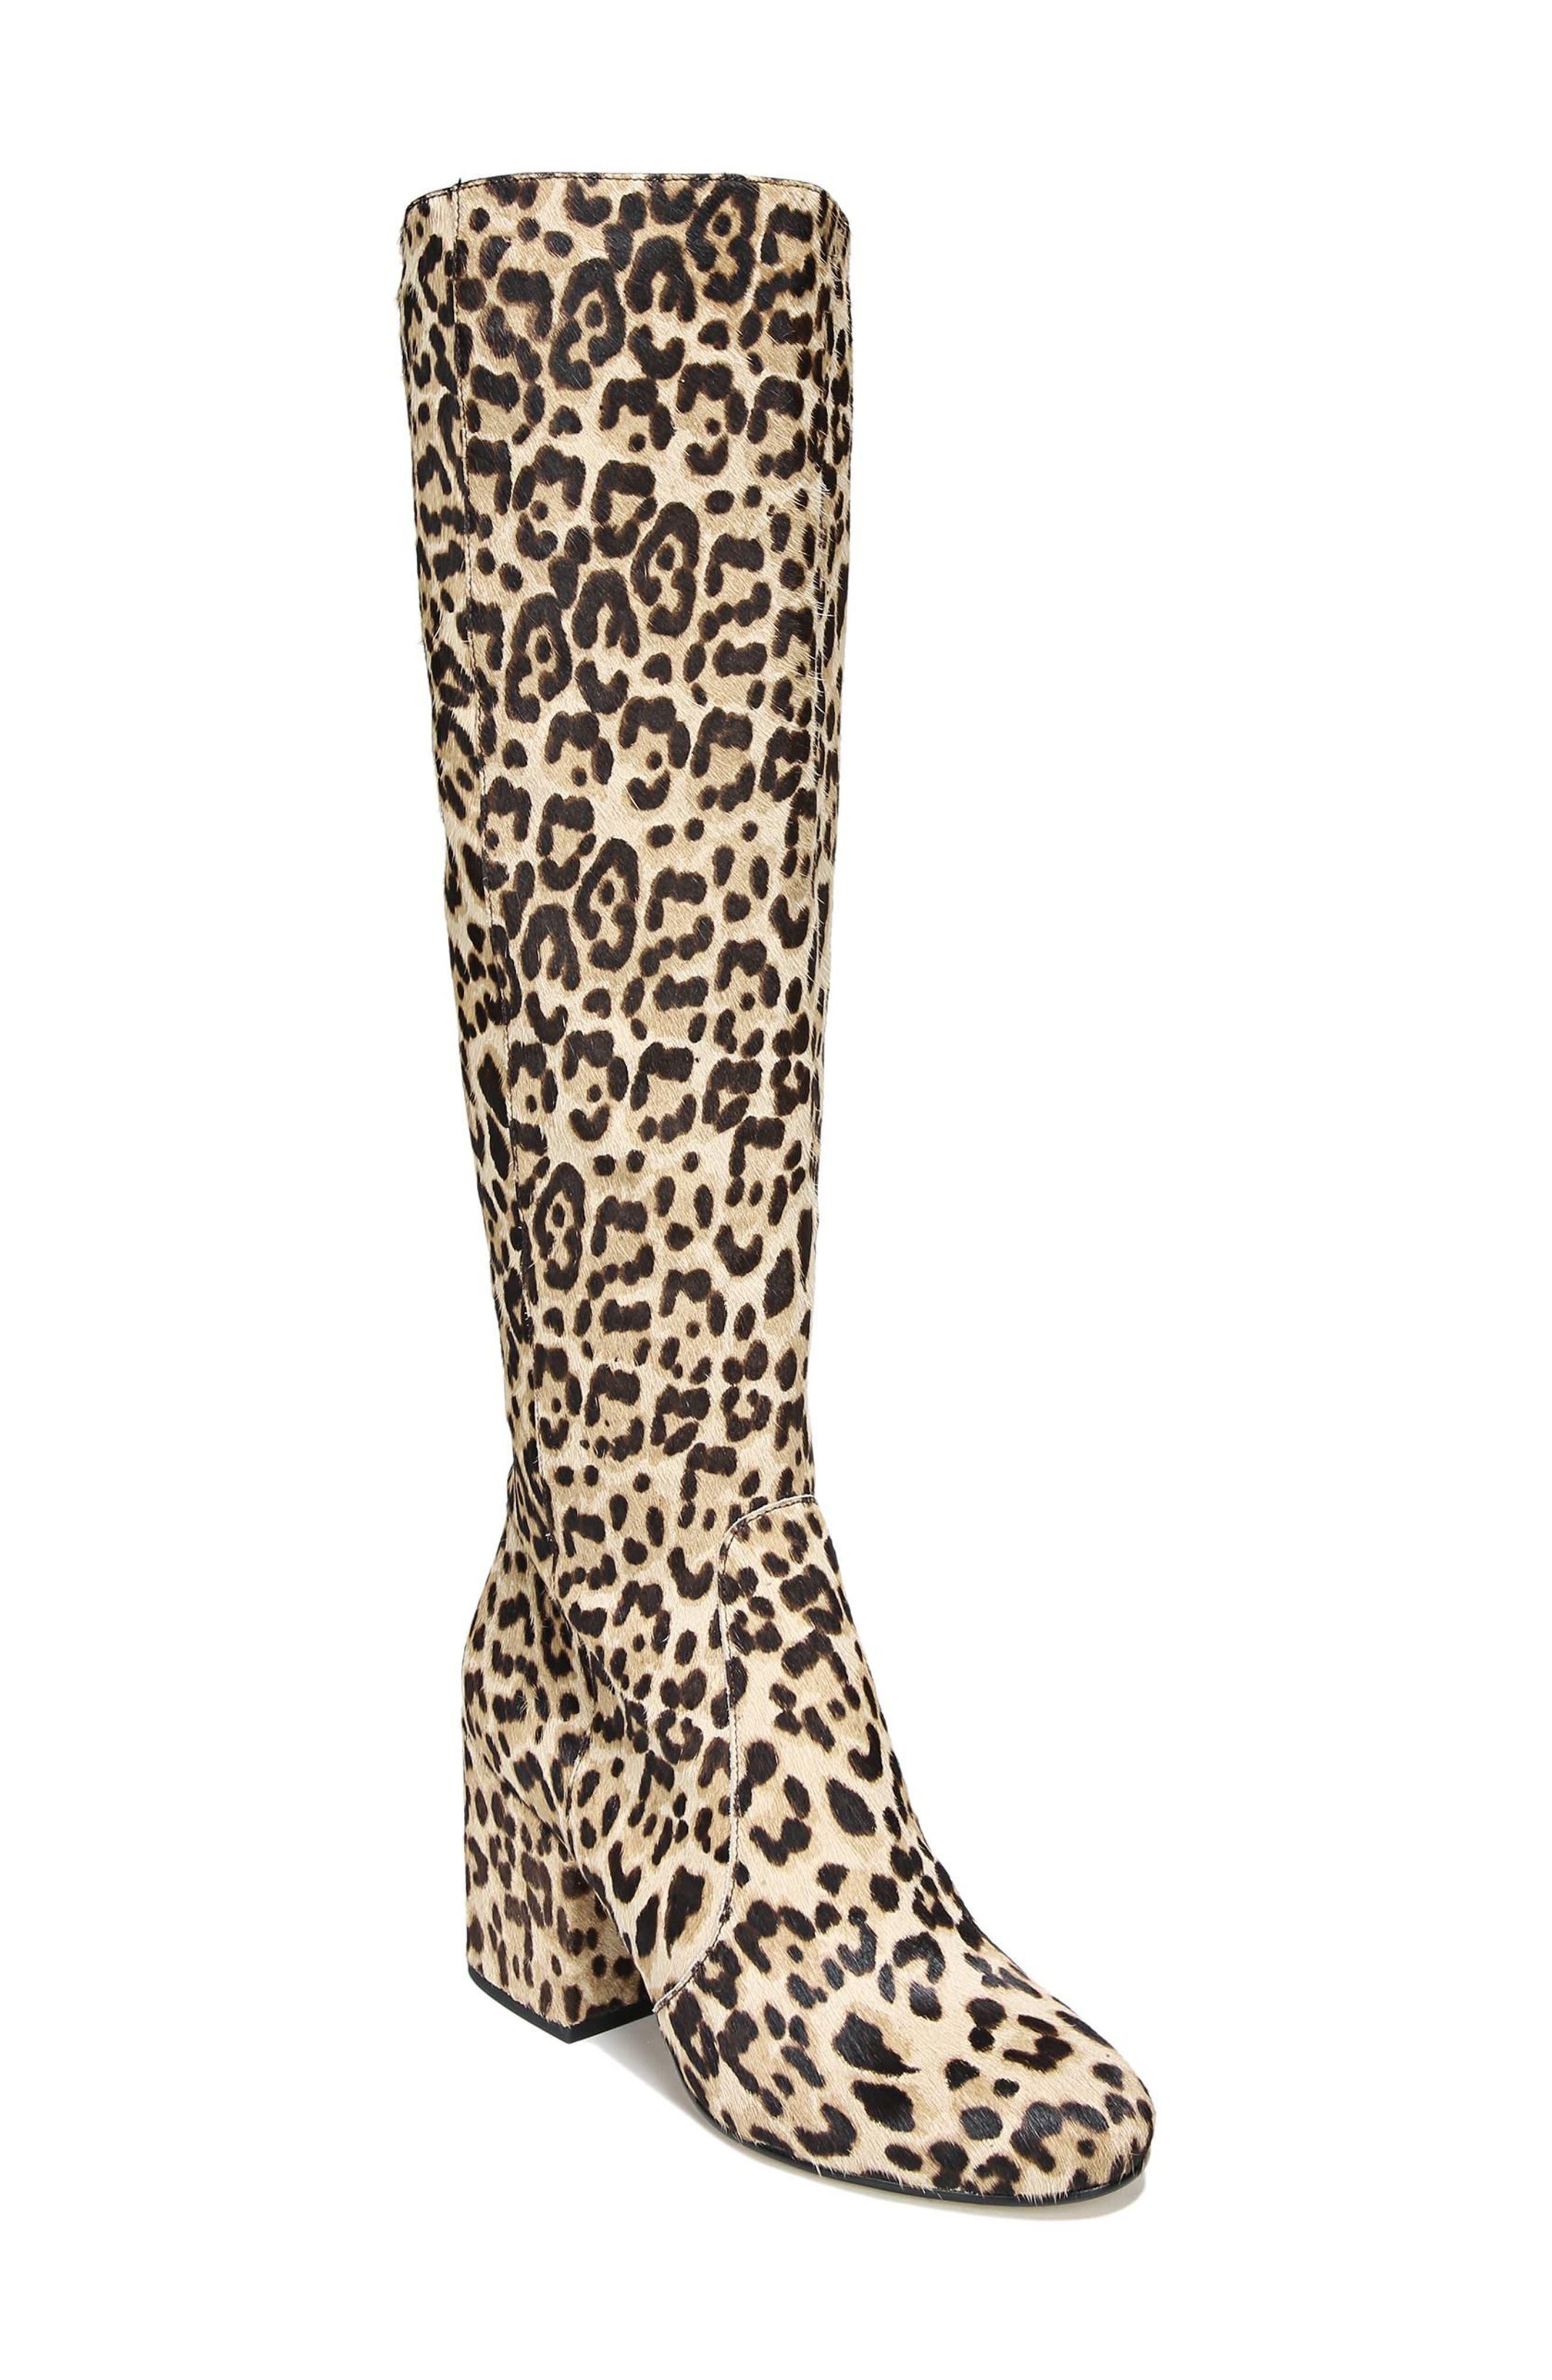 Alternate Image 1 Selected - Sam Edelman Thora Genuine Calf Hair Knee High Boot (Women)